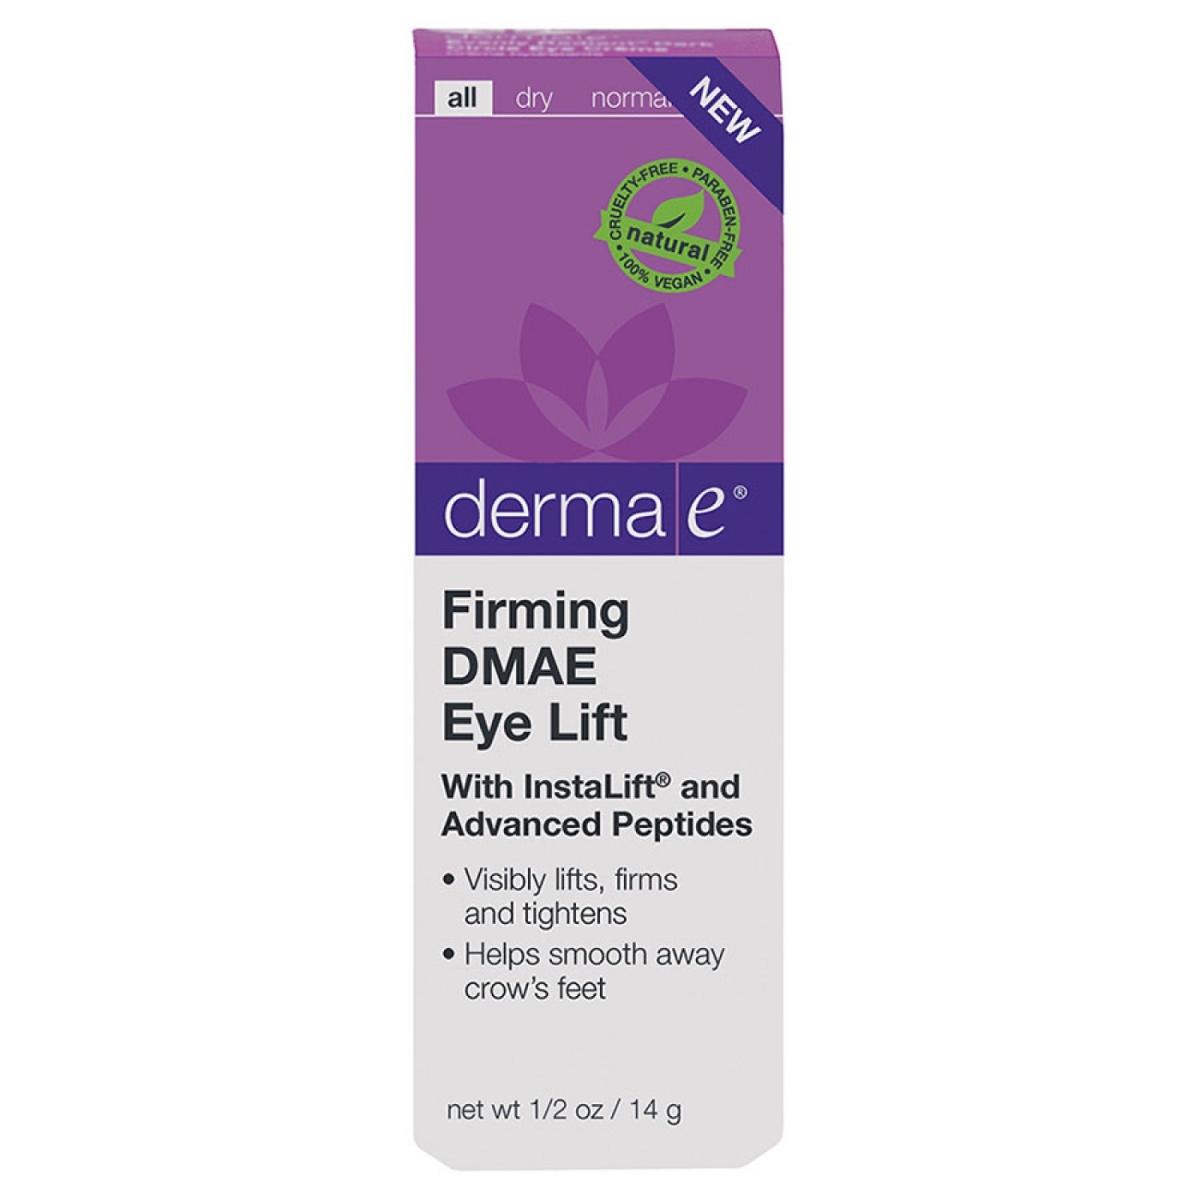 Frontier 228917 5 oz Derma E Facial Moisturizer DMAE Firming Eye Lift